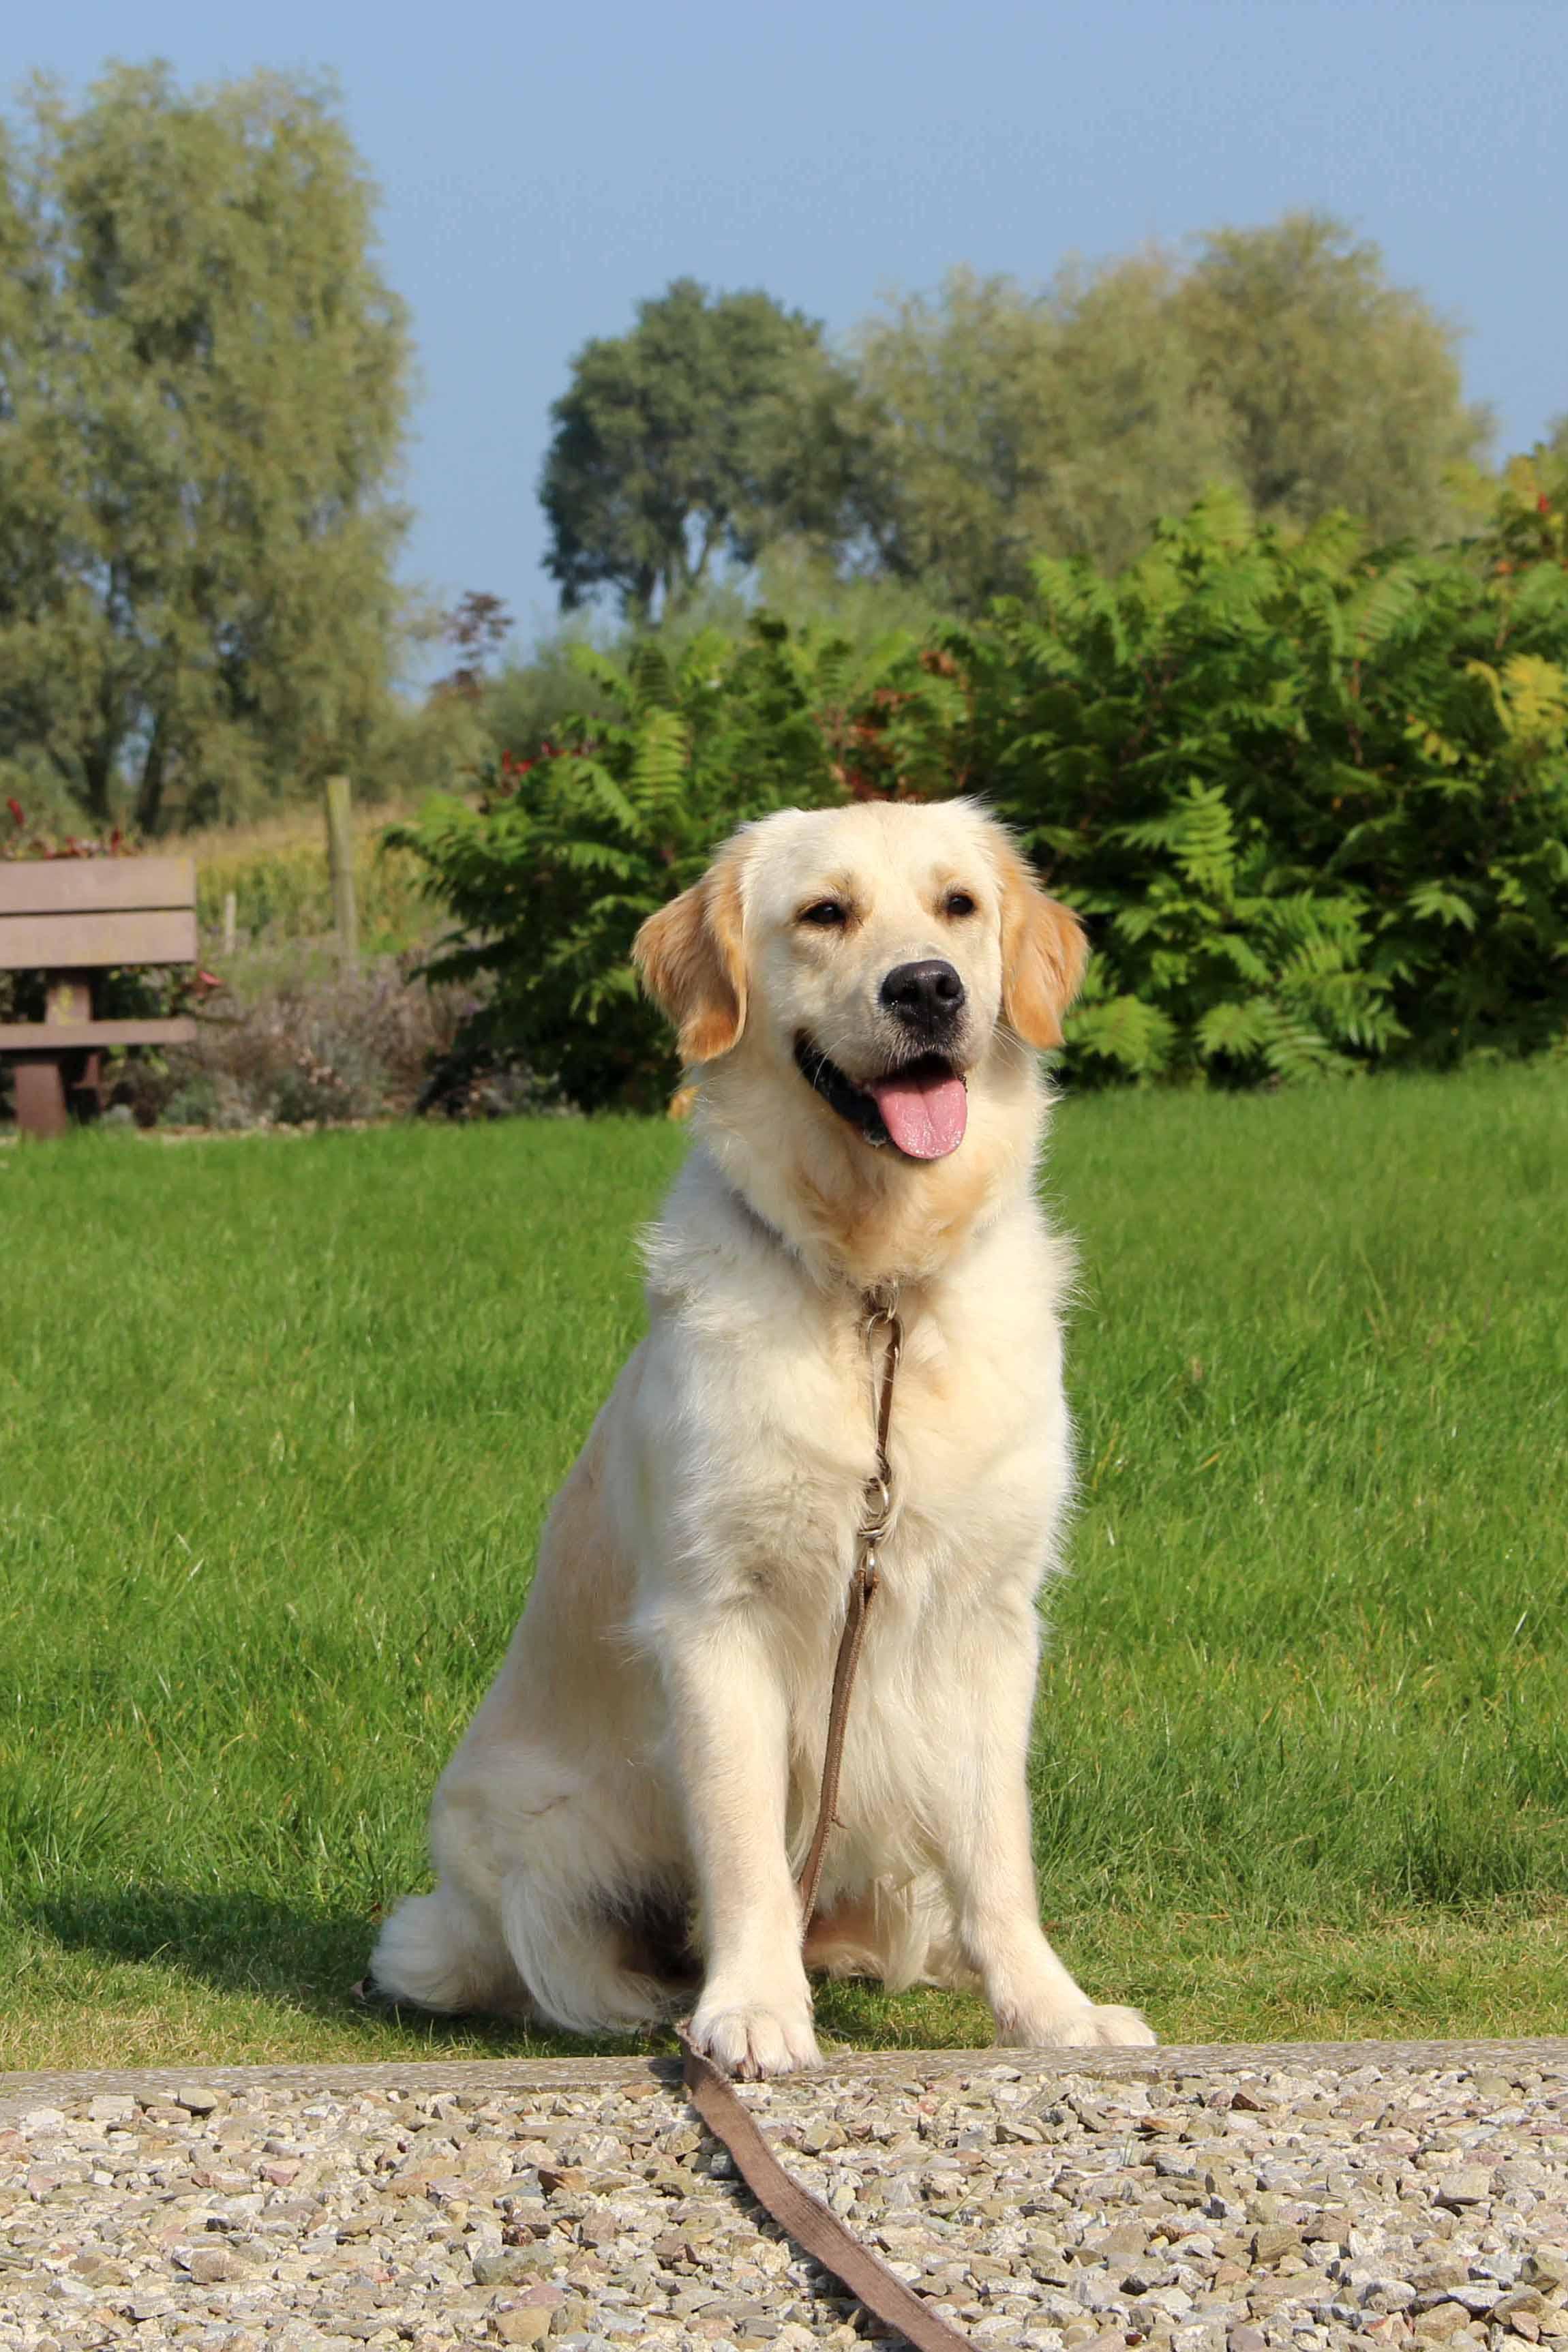 Golden retriever Pippa